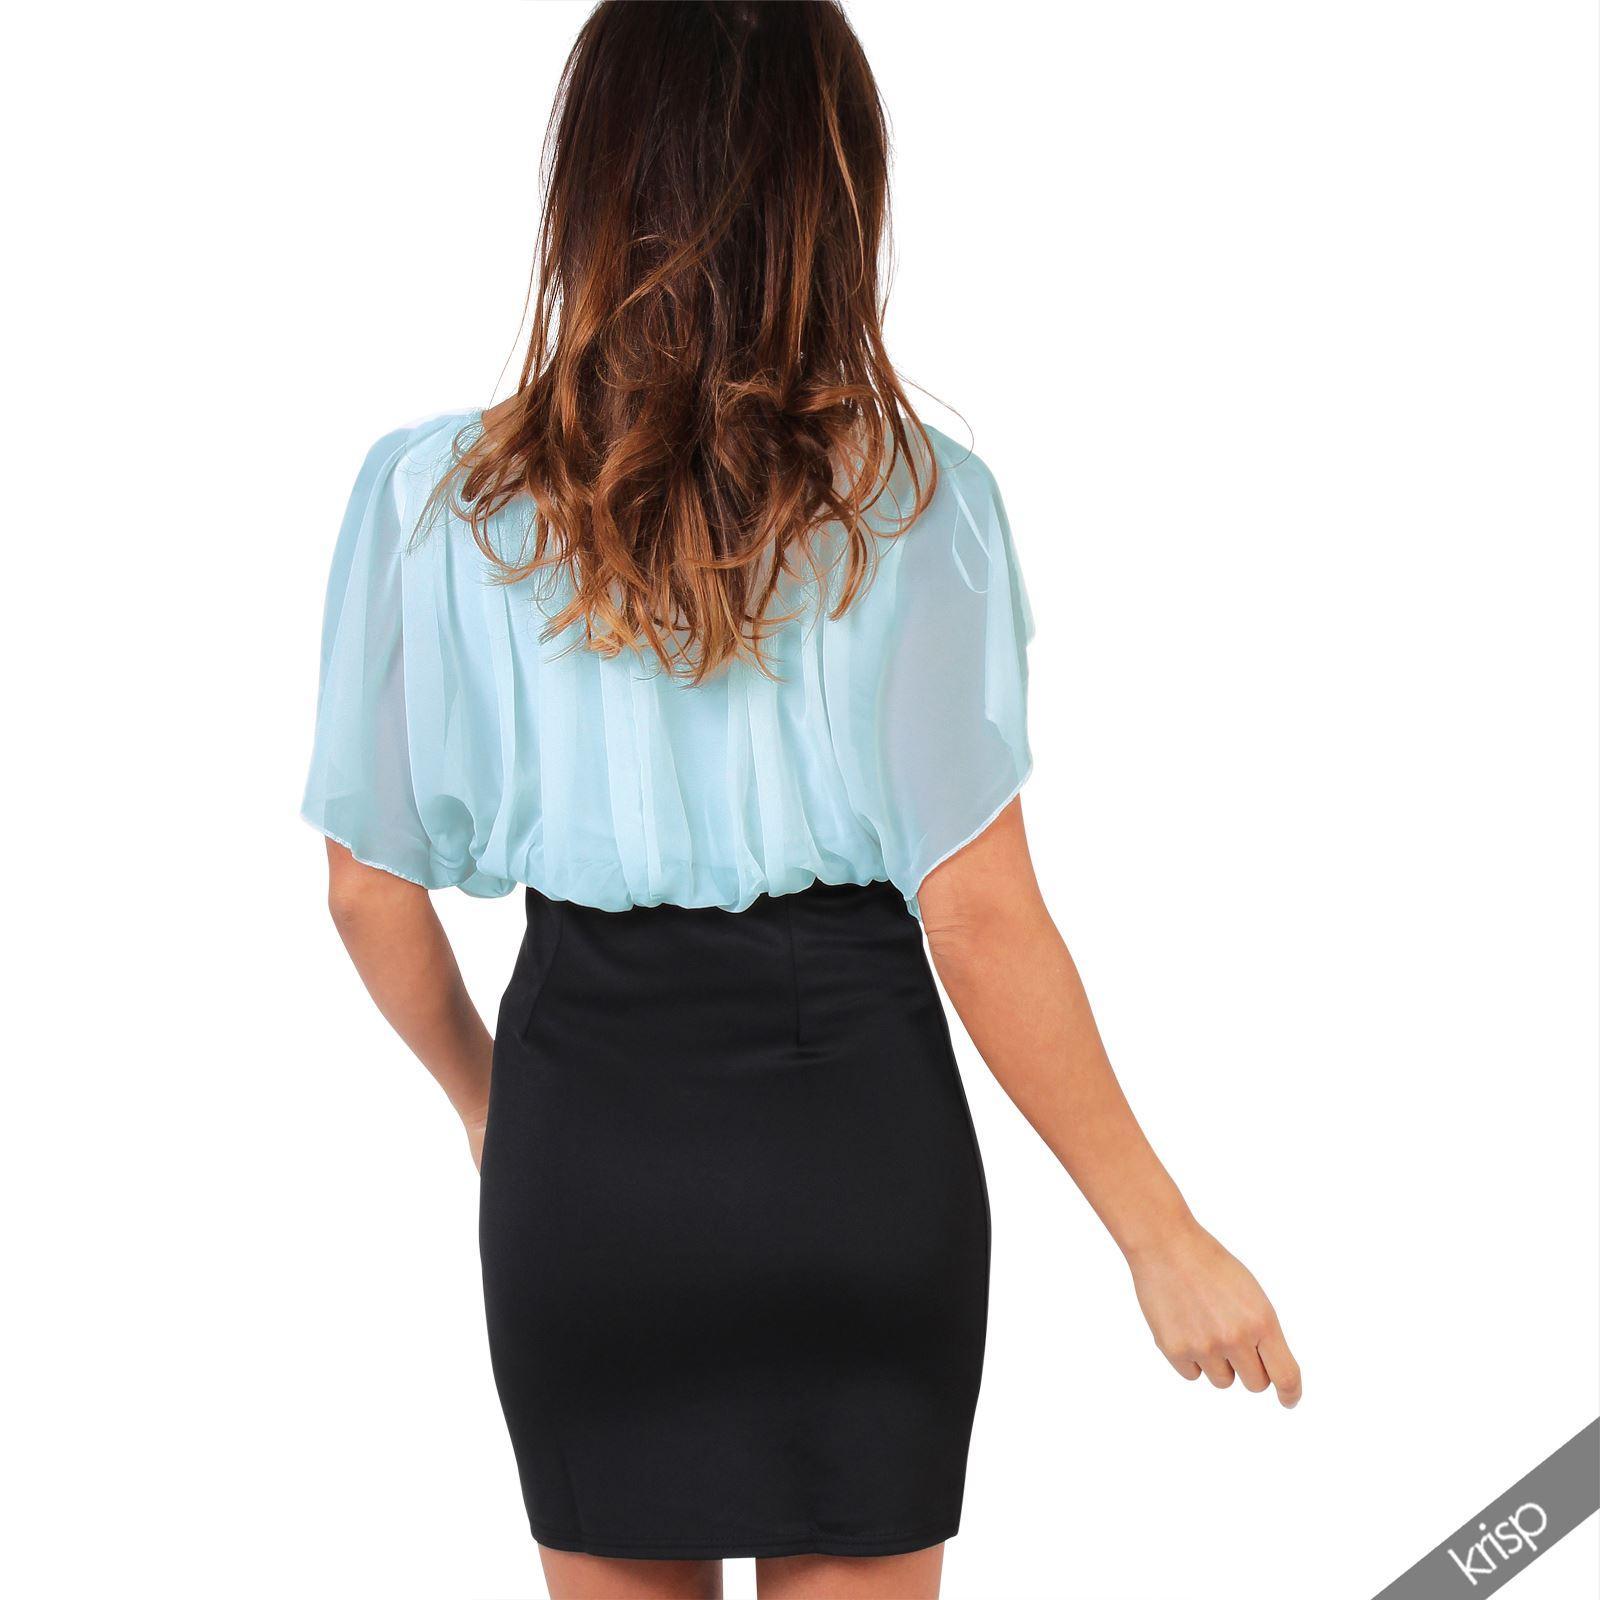 Womens-Pleated-Chiffon-Batwing-Top-High-Waist-Pencil-Bodycon-Skirt-Mini-Dress thumbnail 4